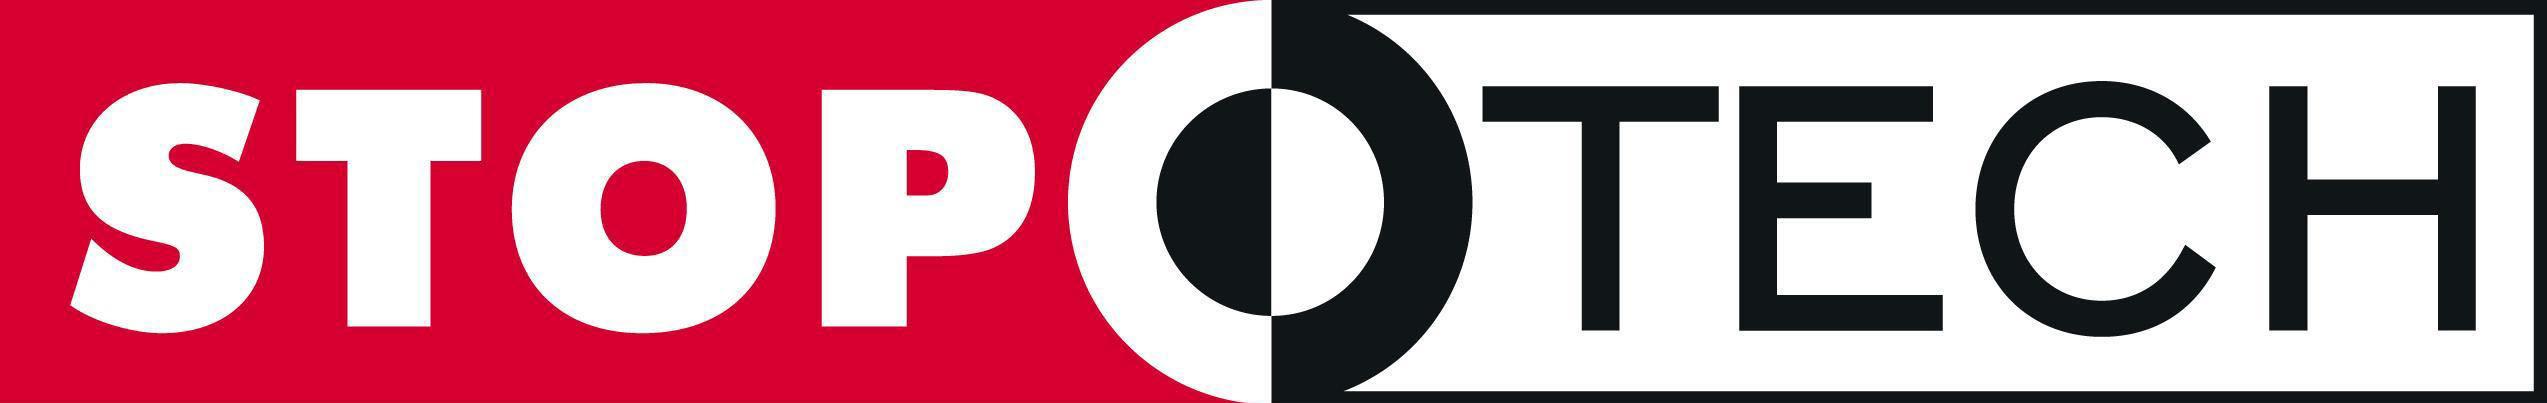 StopTech-logo